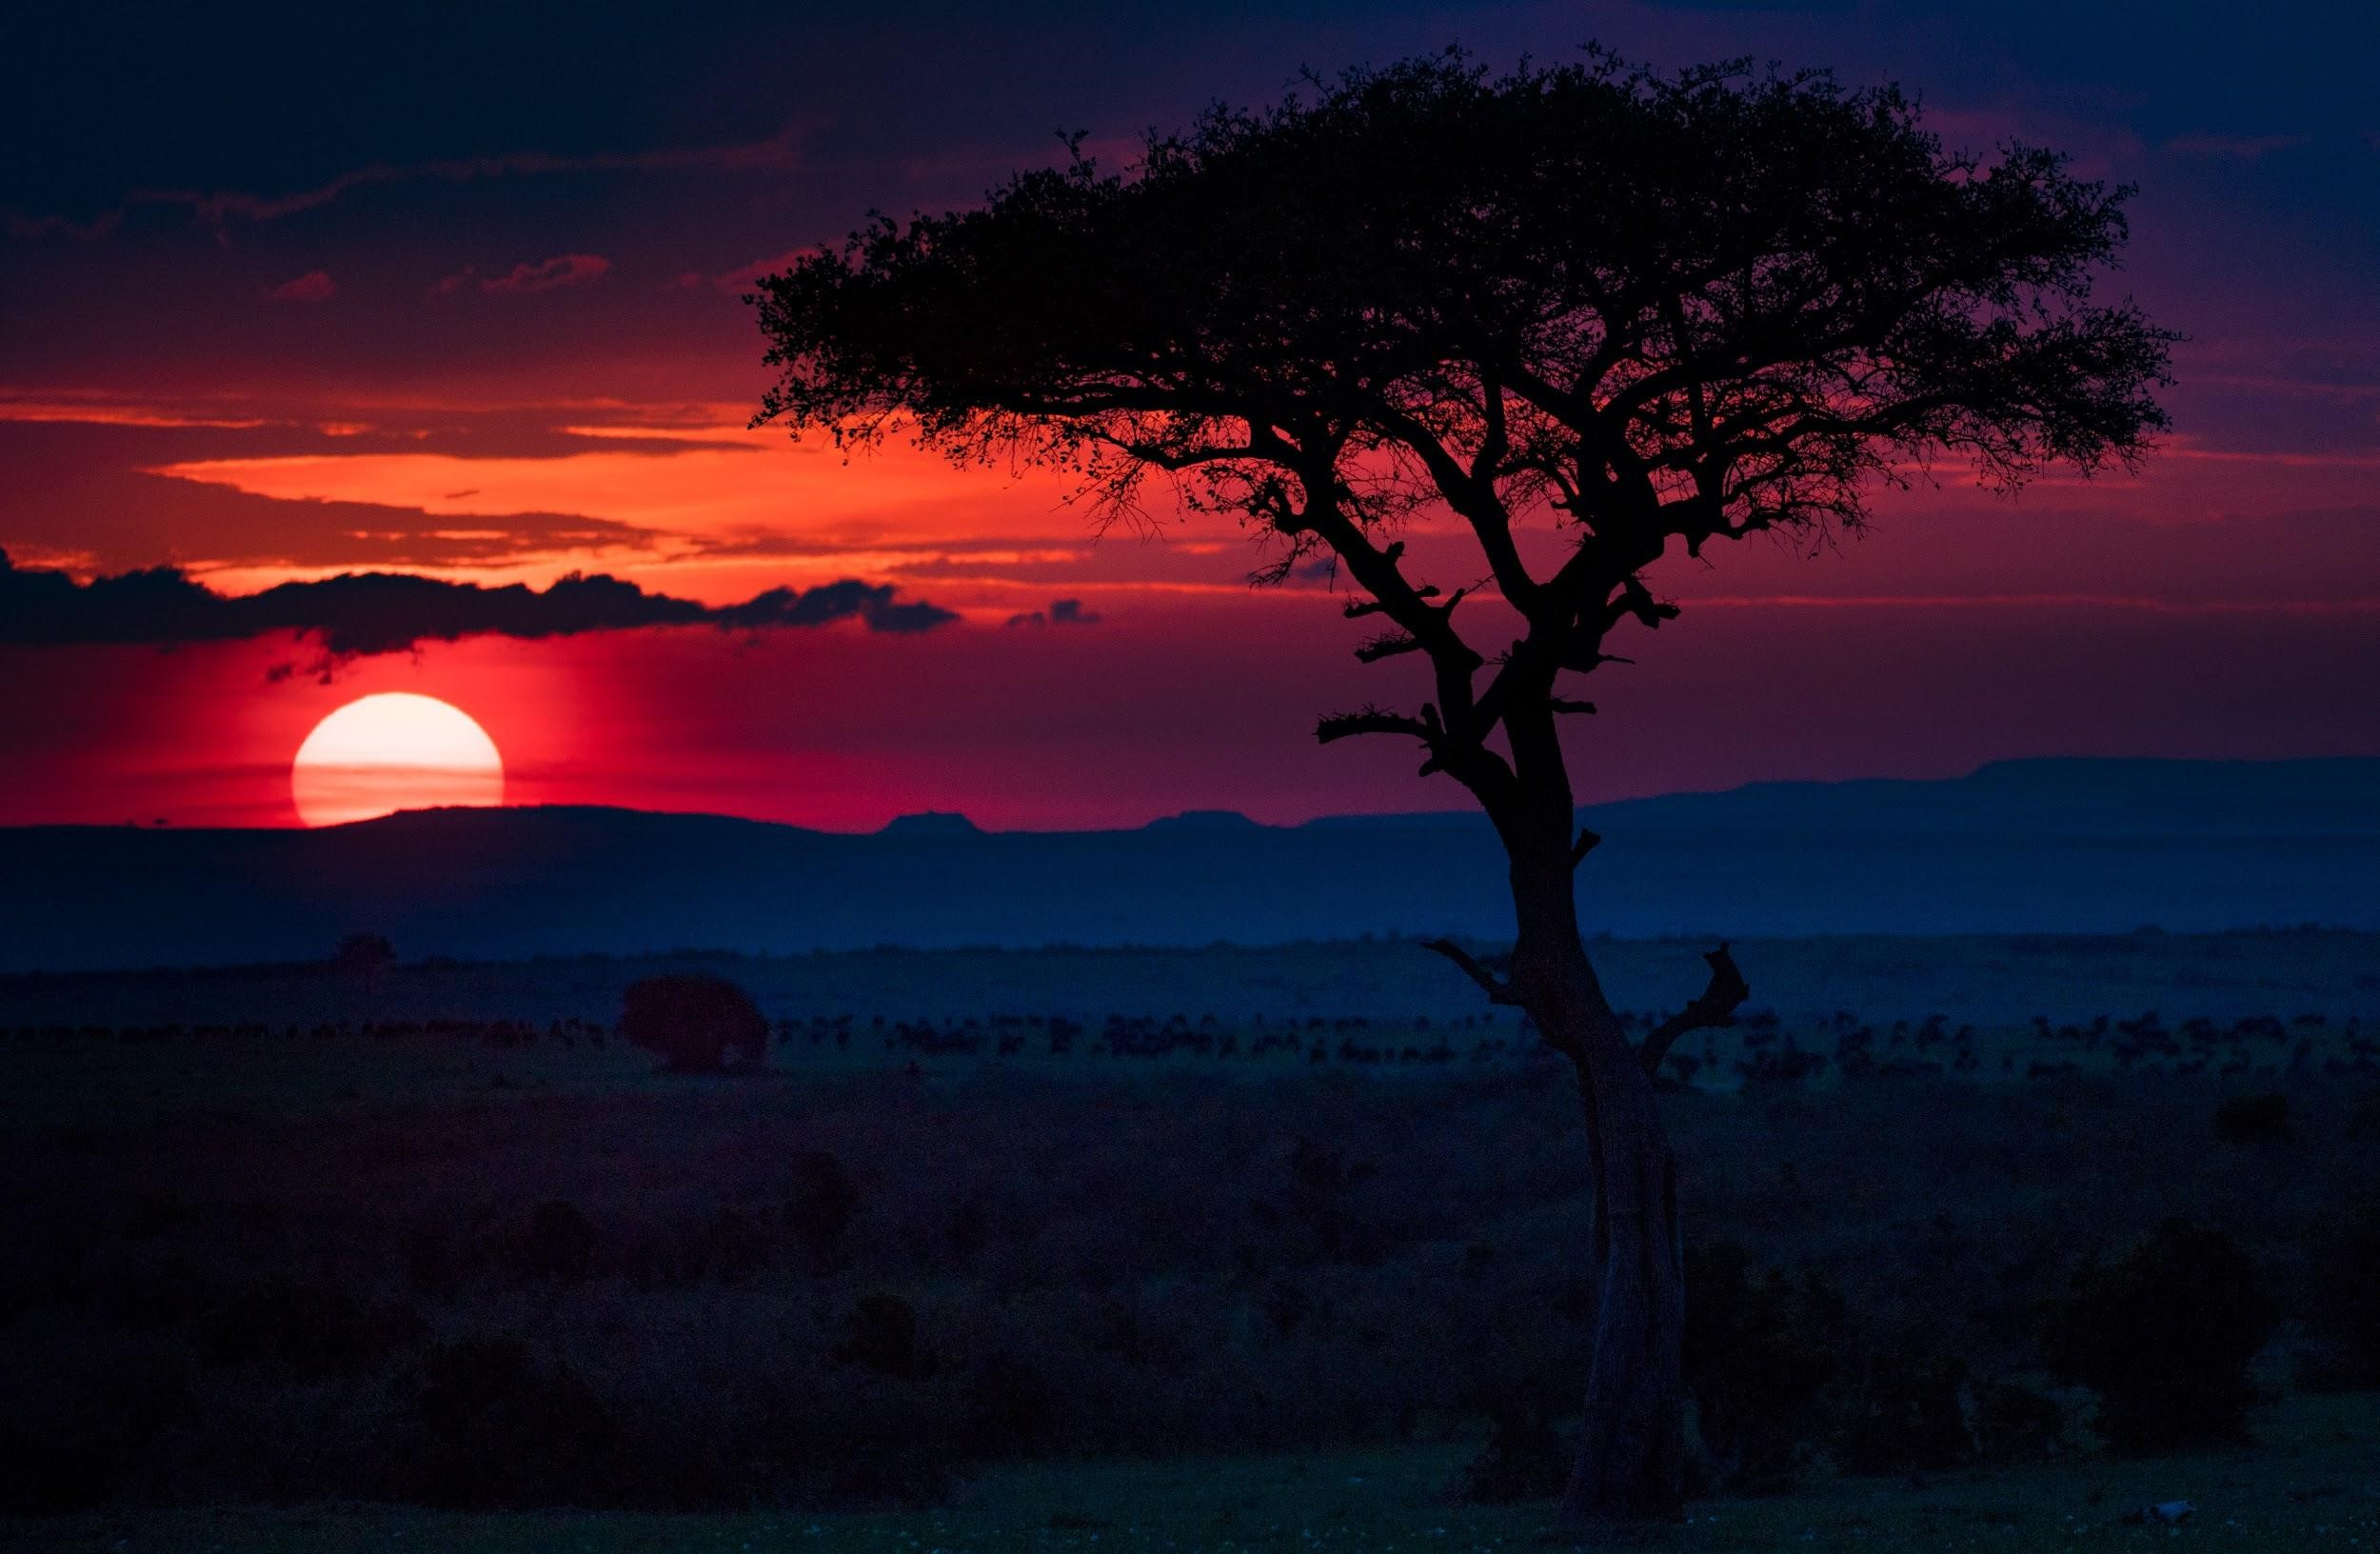 sunset view masaimara safari africa.jpg